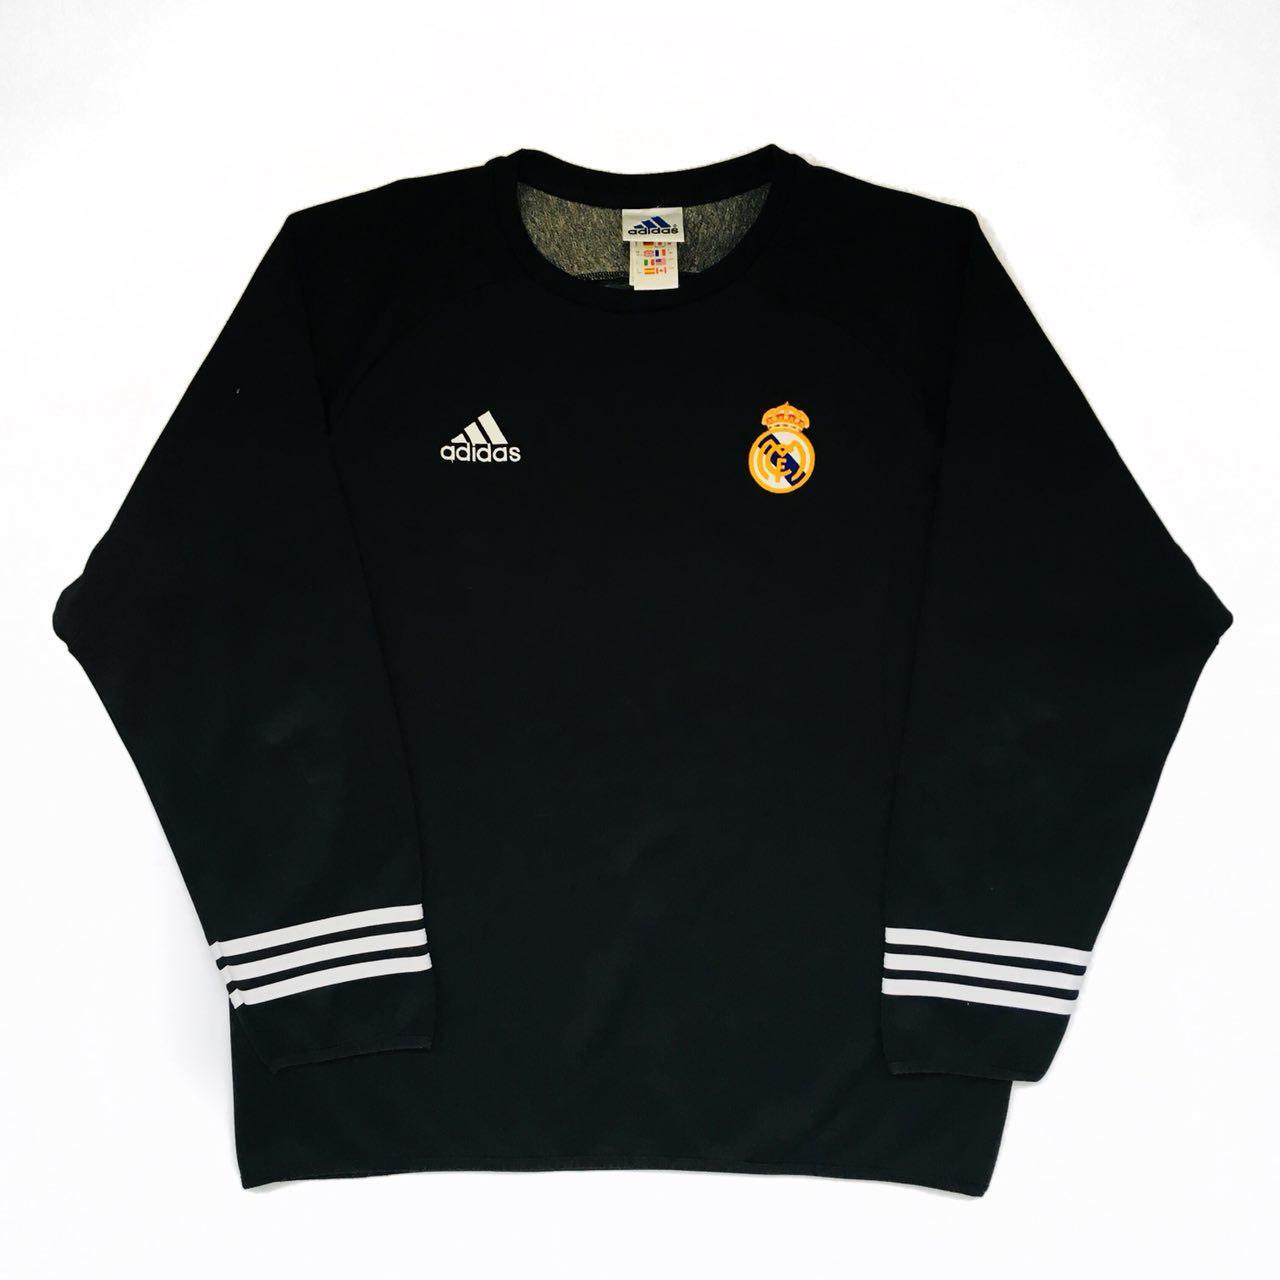 8f6b80e93b4 Real Madrid Training Leisure Maillot de foot 2001 - 2002.